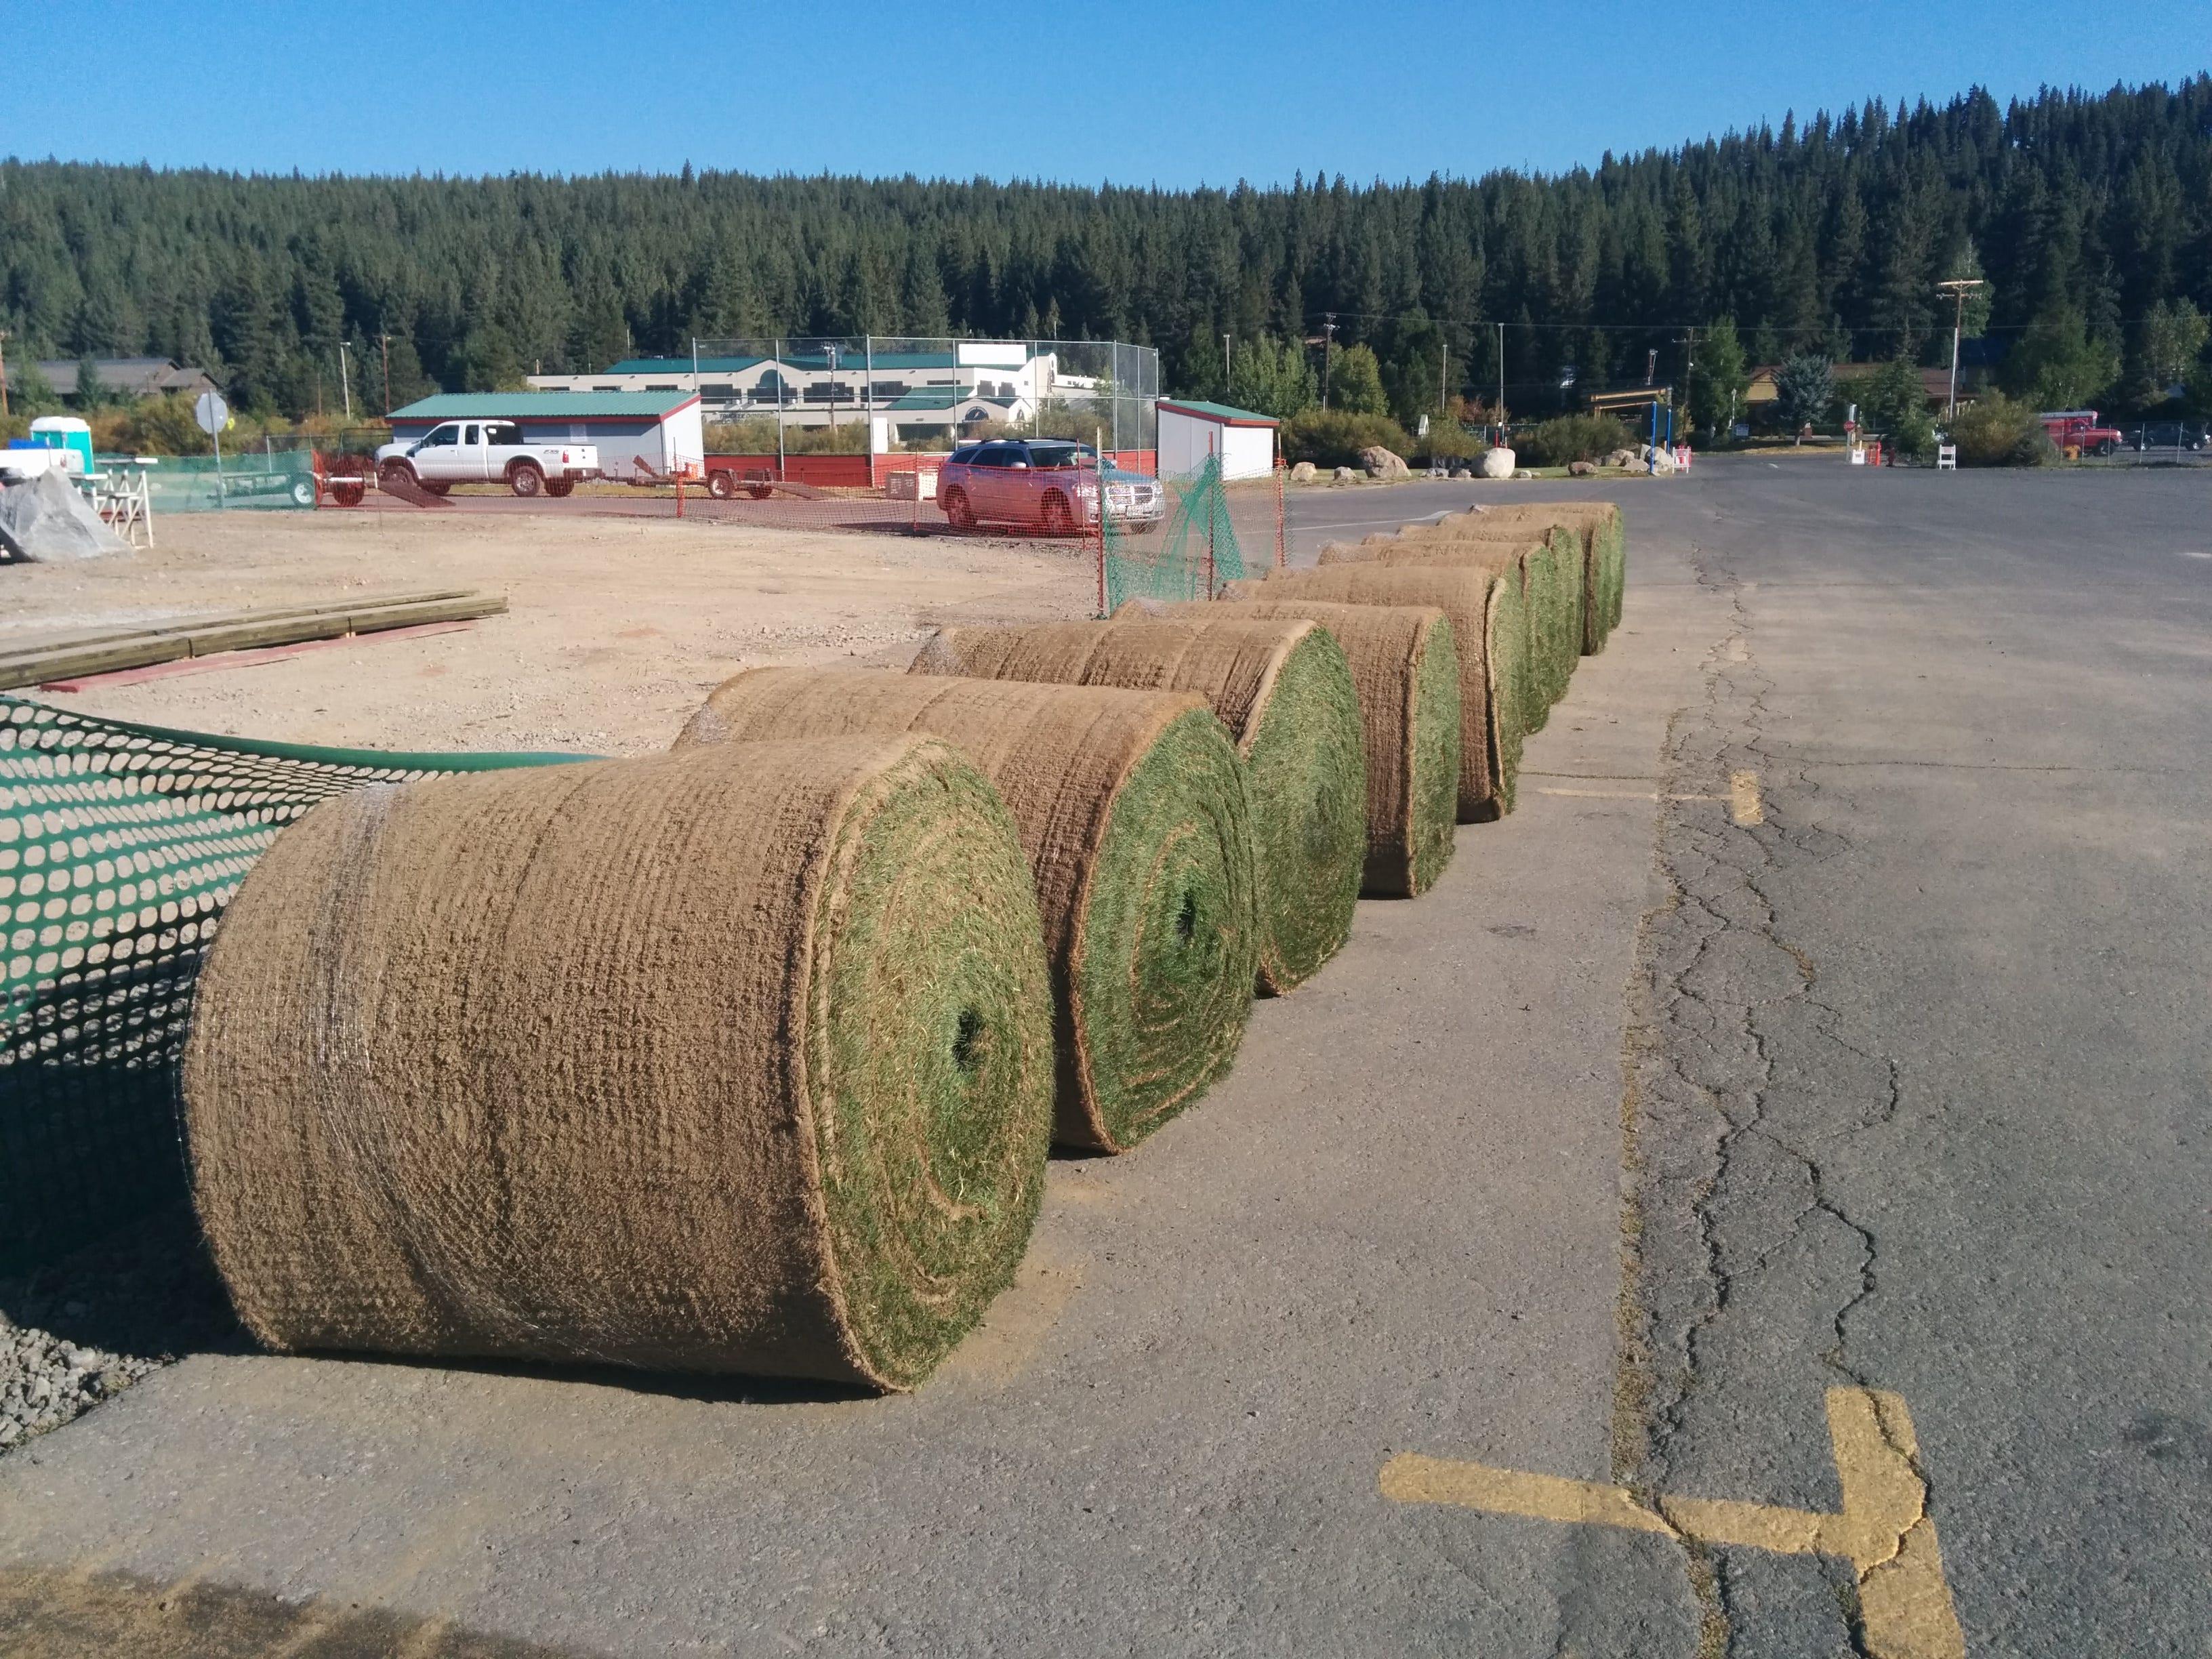 Rolls of sod for the Truckee baseball field.